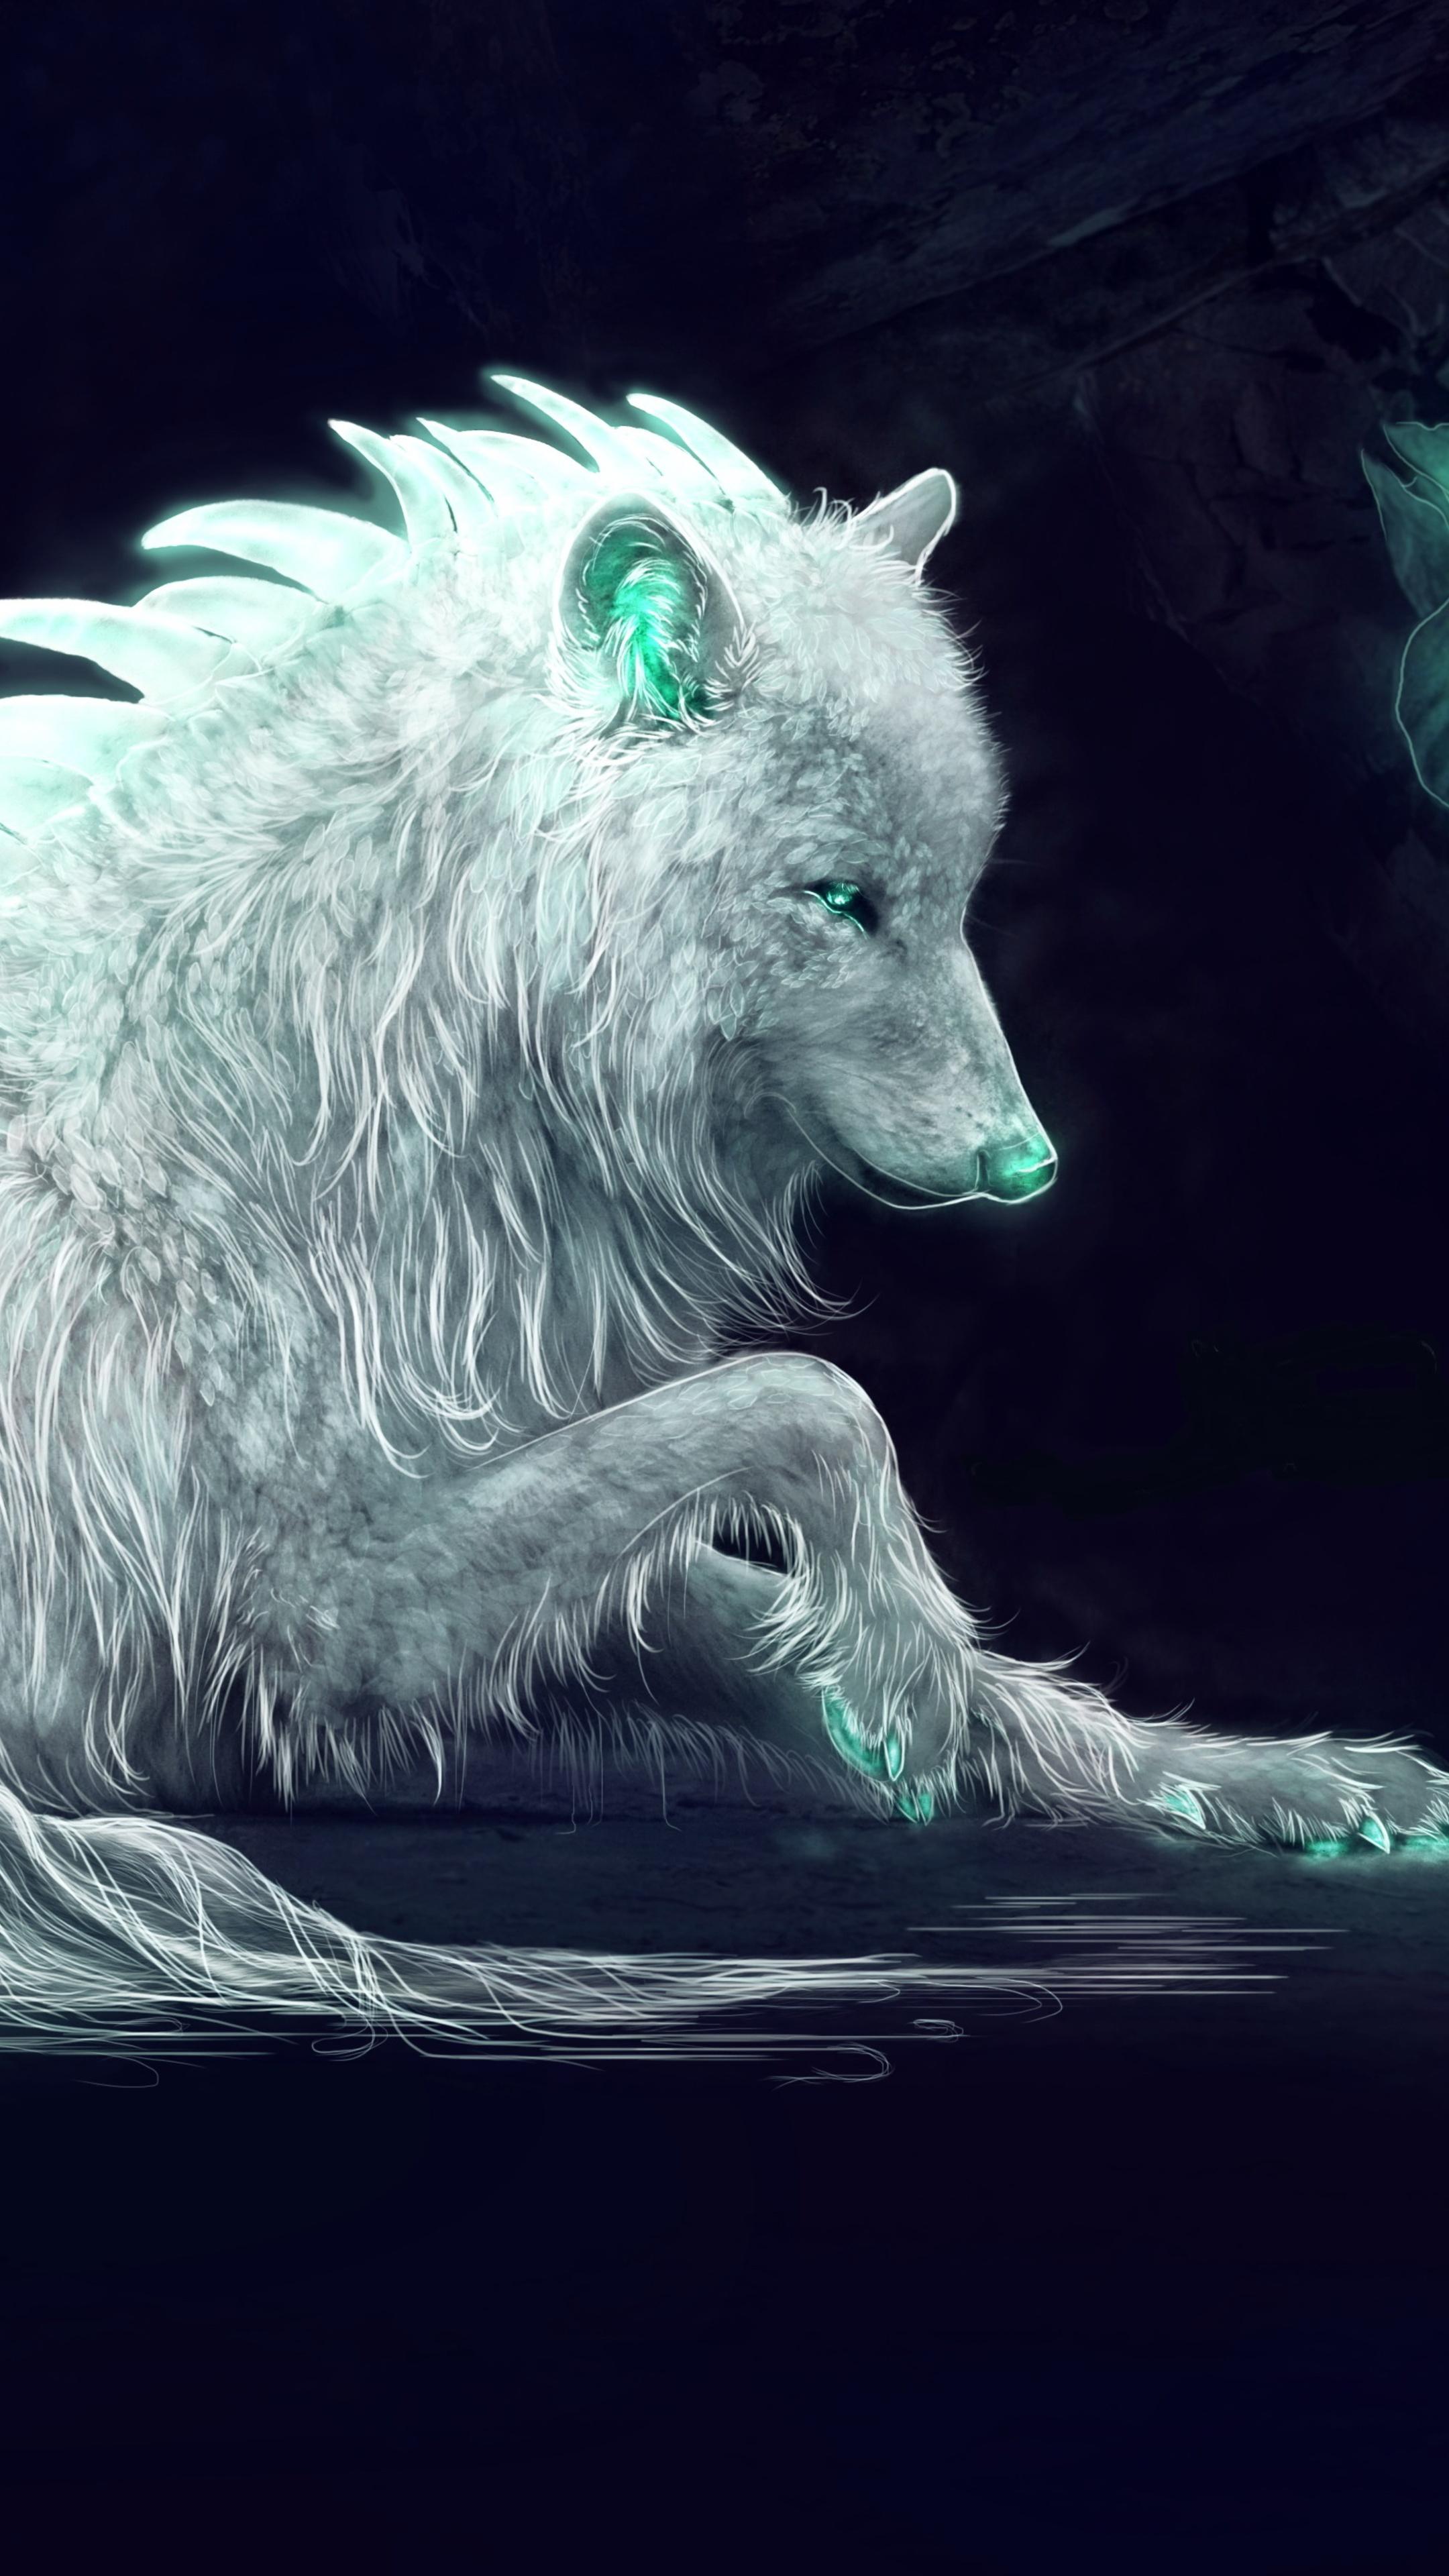 2160x3840 white wolf fan art sony xperia x xz z5 premium - Art wallpaper 2160x3840 ...